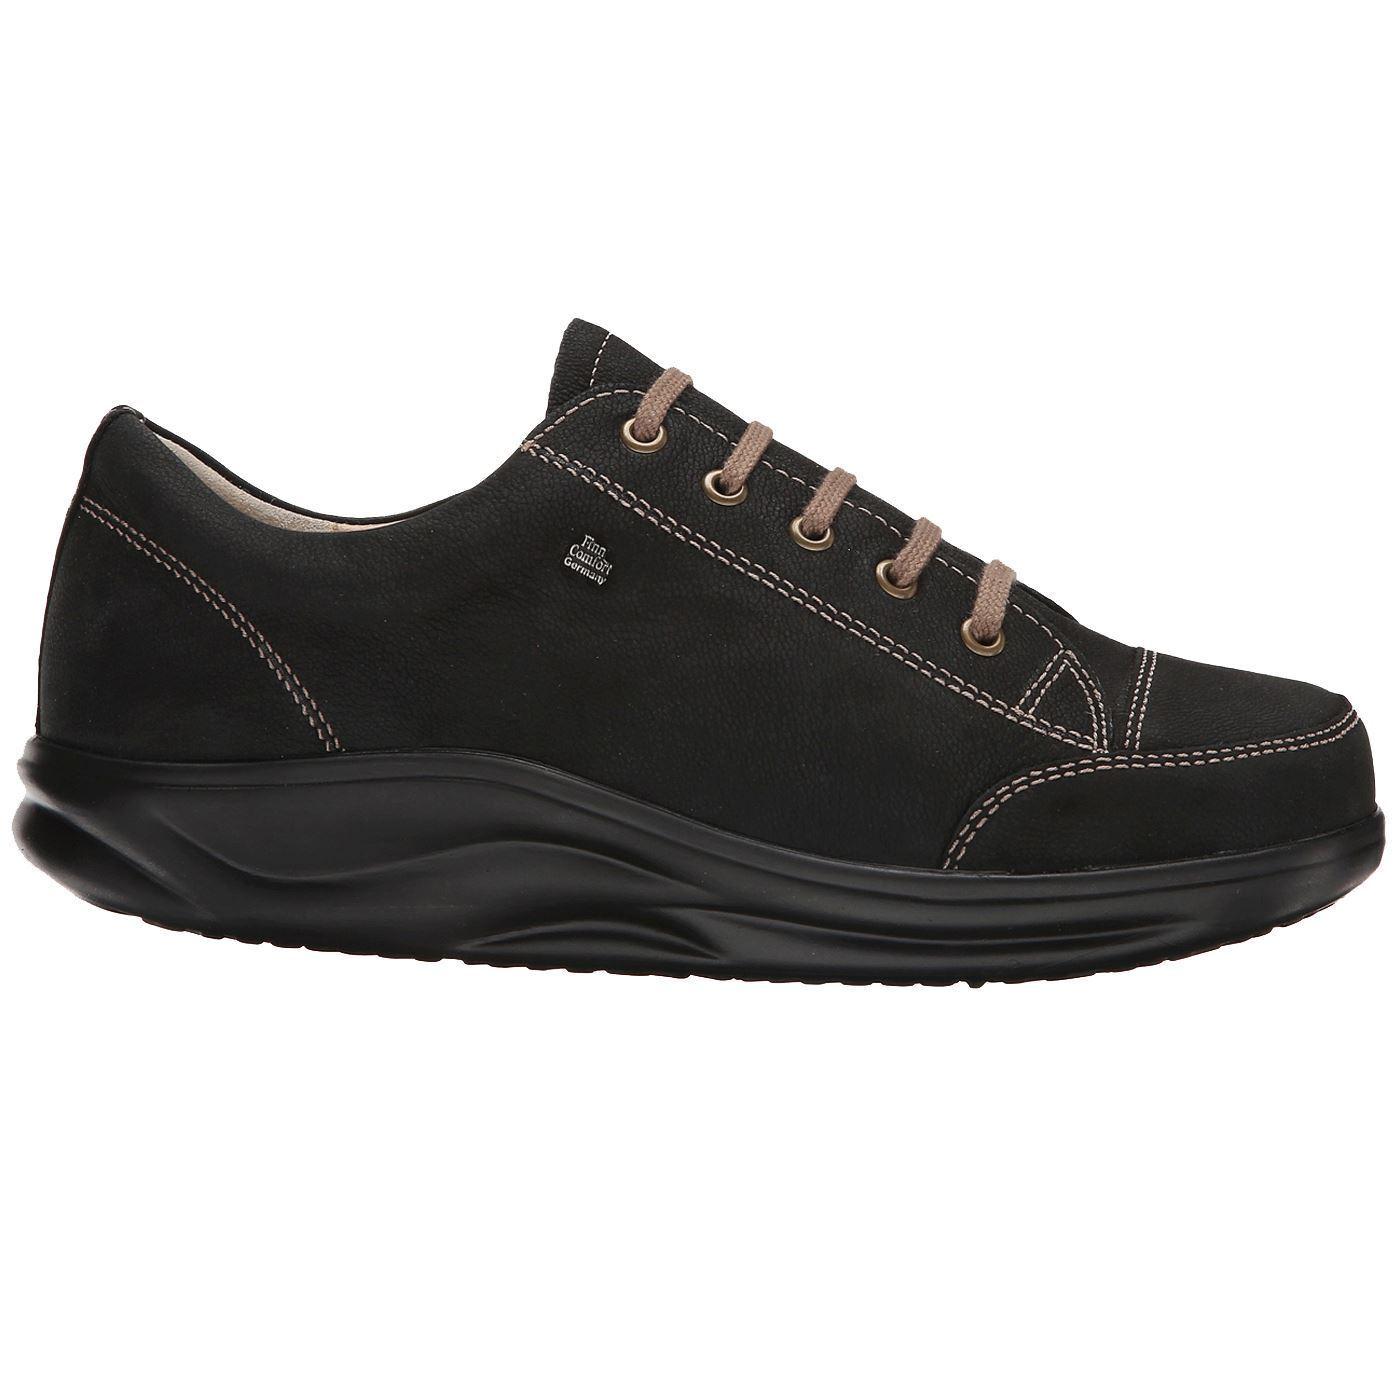 Finn Comfort 2911 Ikebukuro Black Womens Shoes Shoes Womens 3e3998